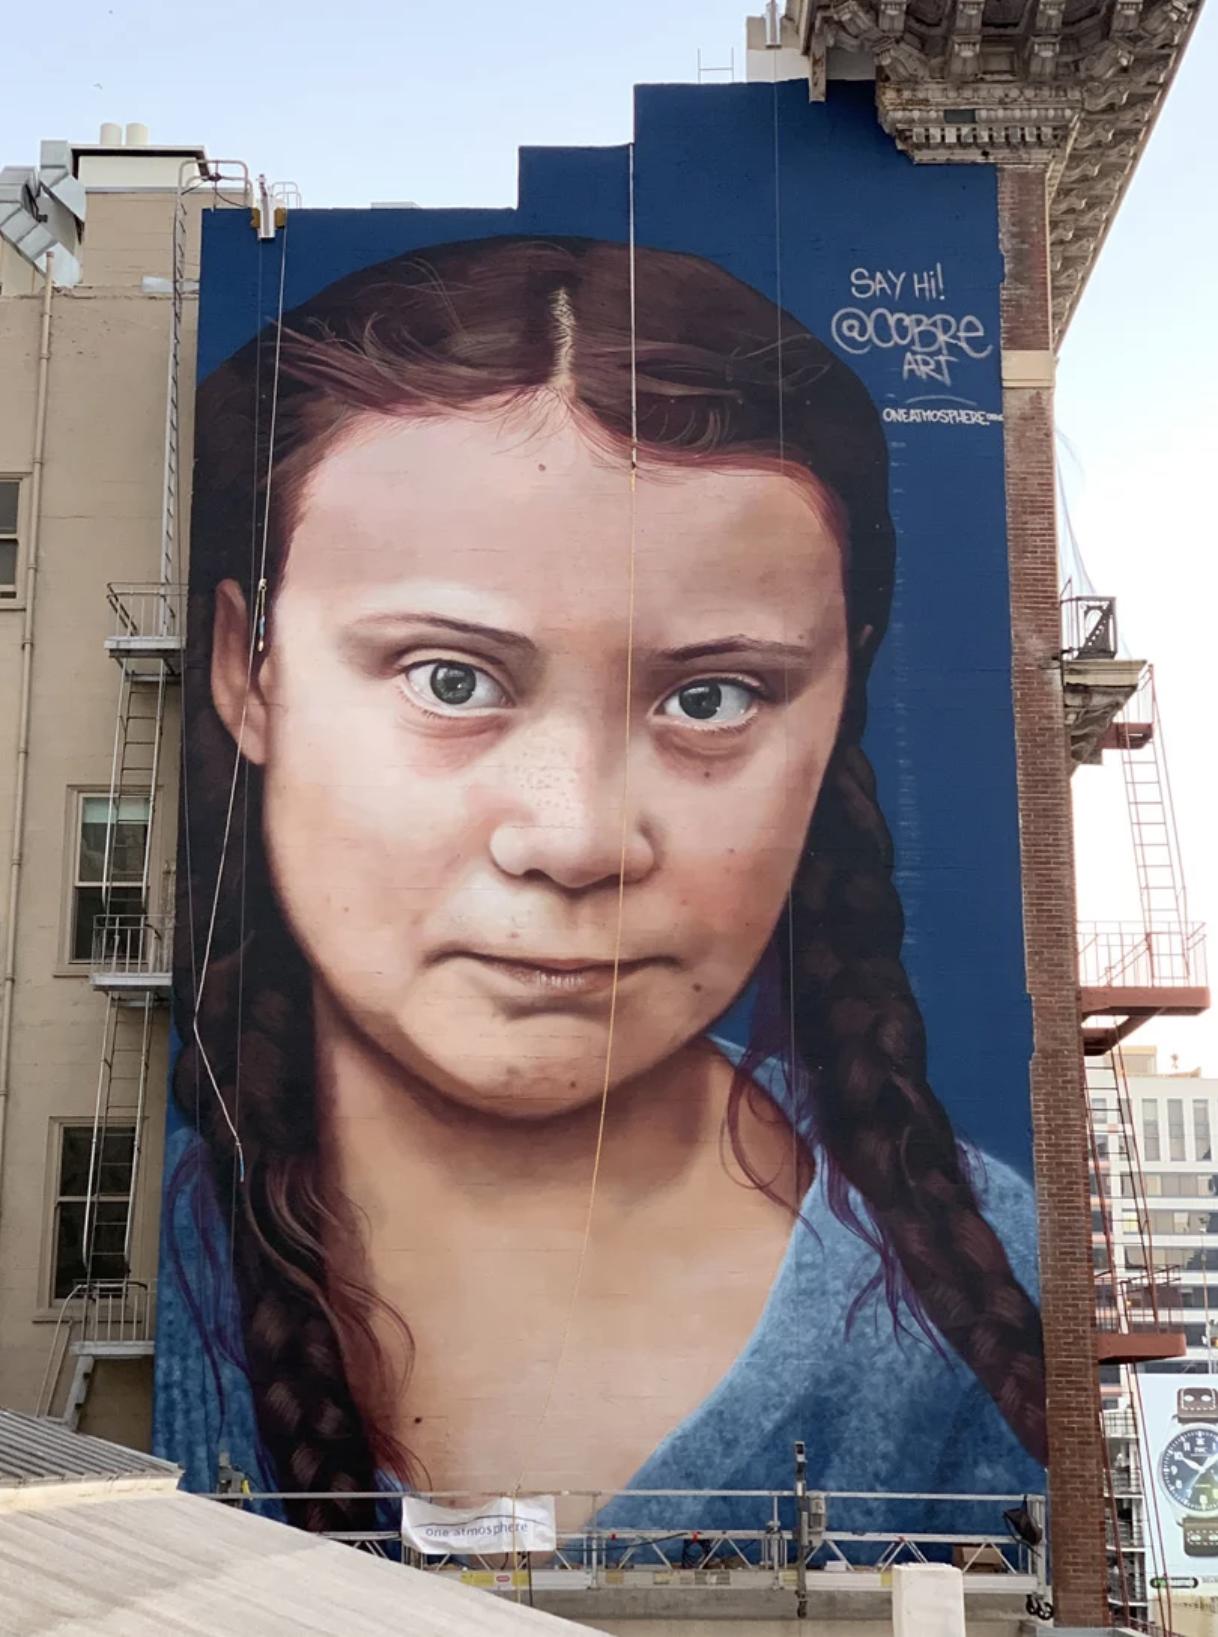 Greta Thunberg, activism on a mural in San Francisco